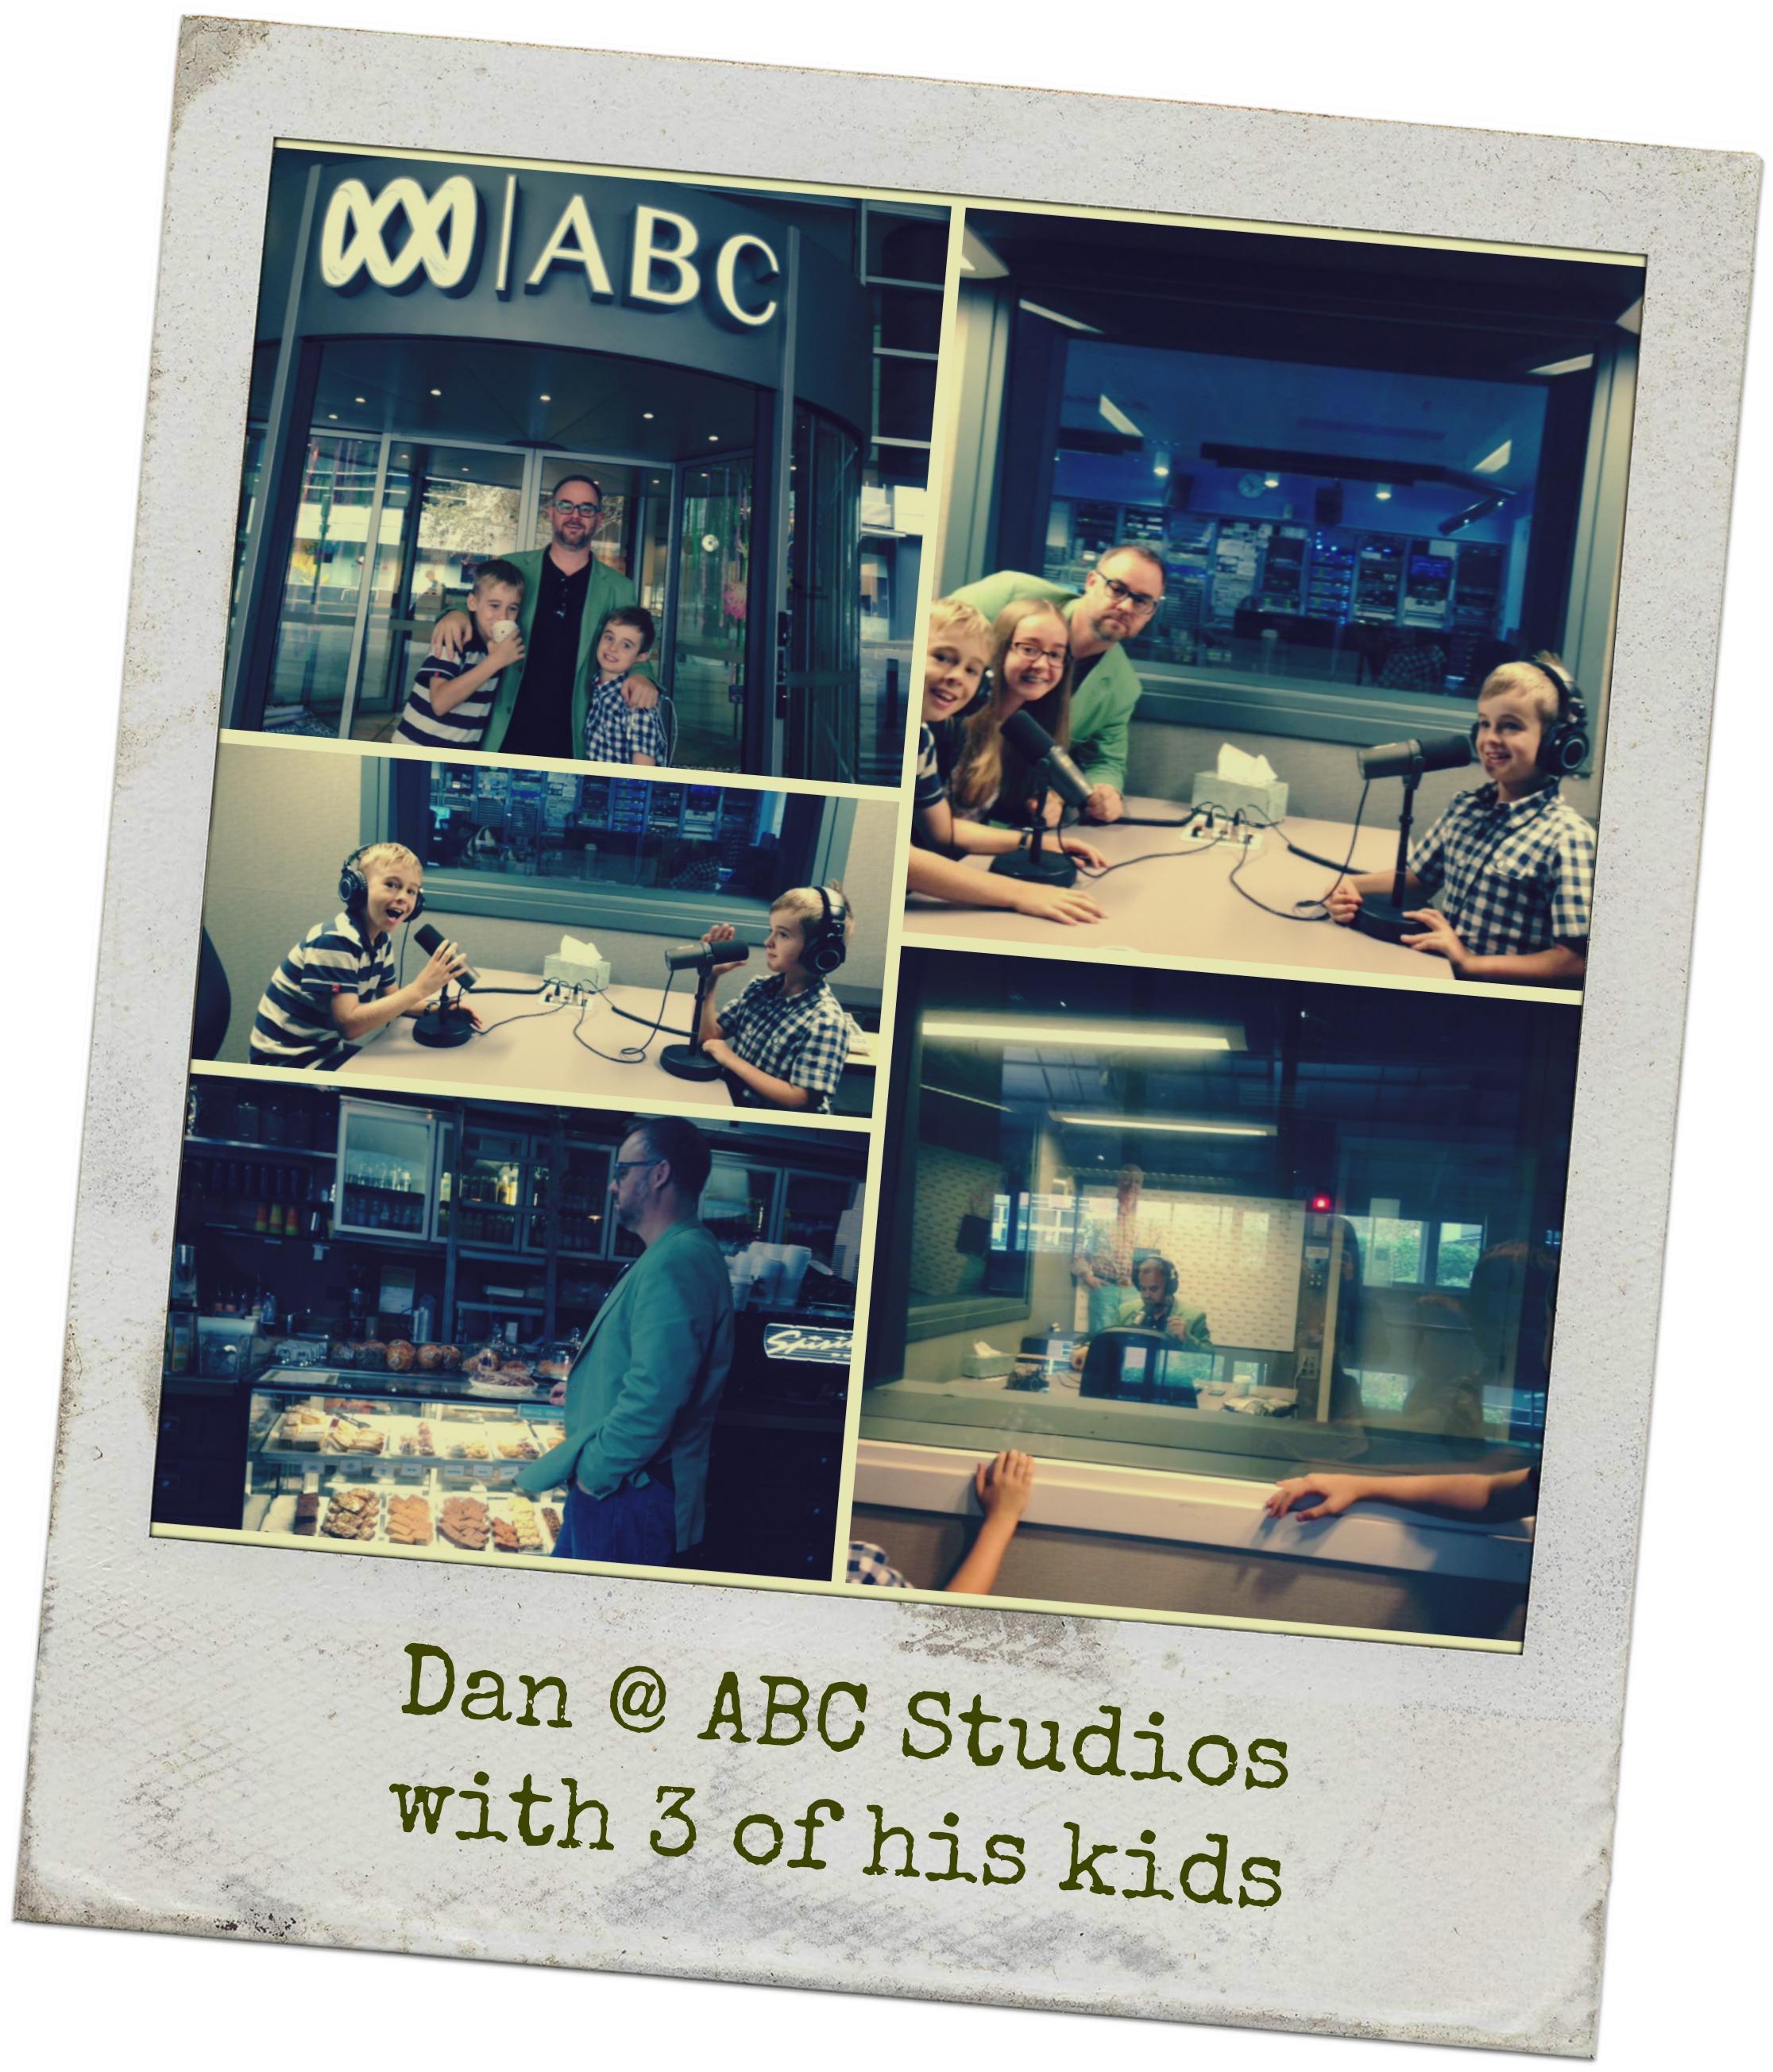 Dan at the ABC studios